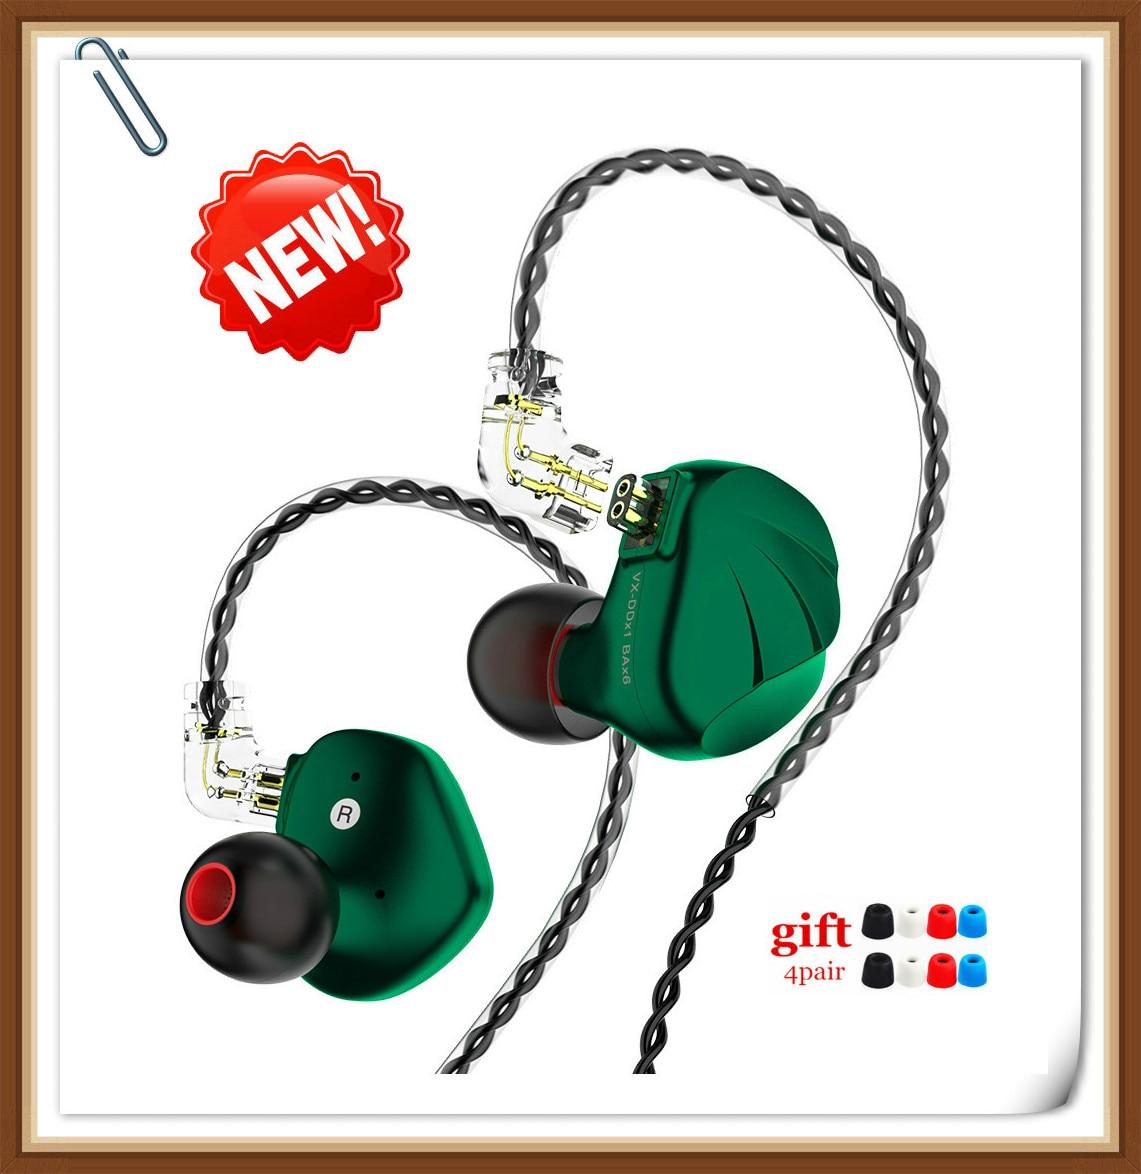 ¡Novedad! Auriculares deportivos TRN VX 6BA + 1DD Hybird Monitor HIFI para correr, auriculares intraurales TRN V90 BA5 T2 T3 T4